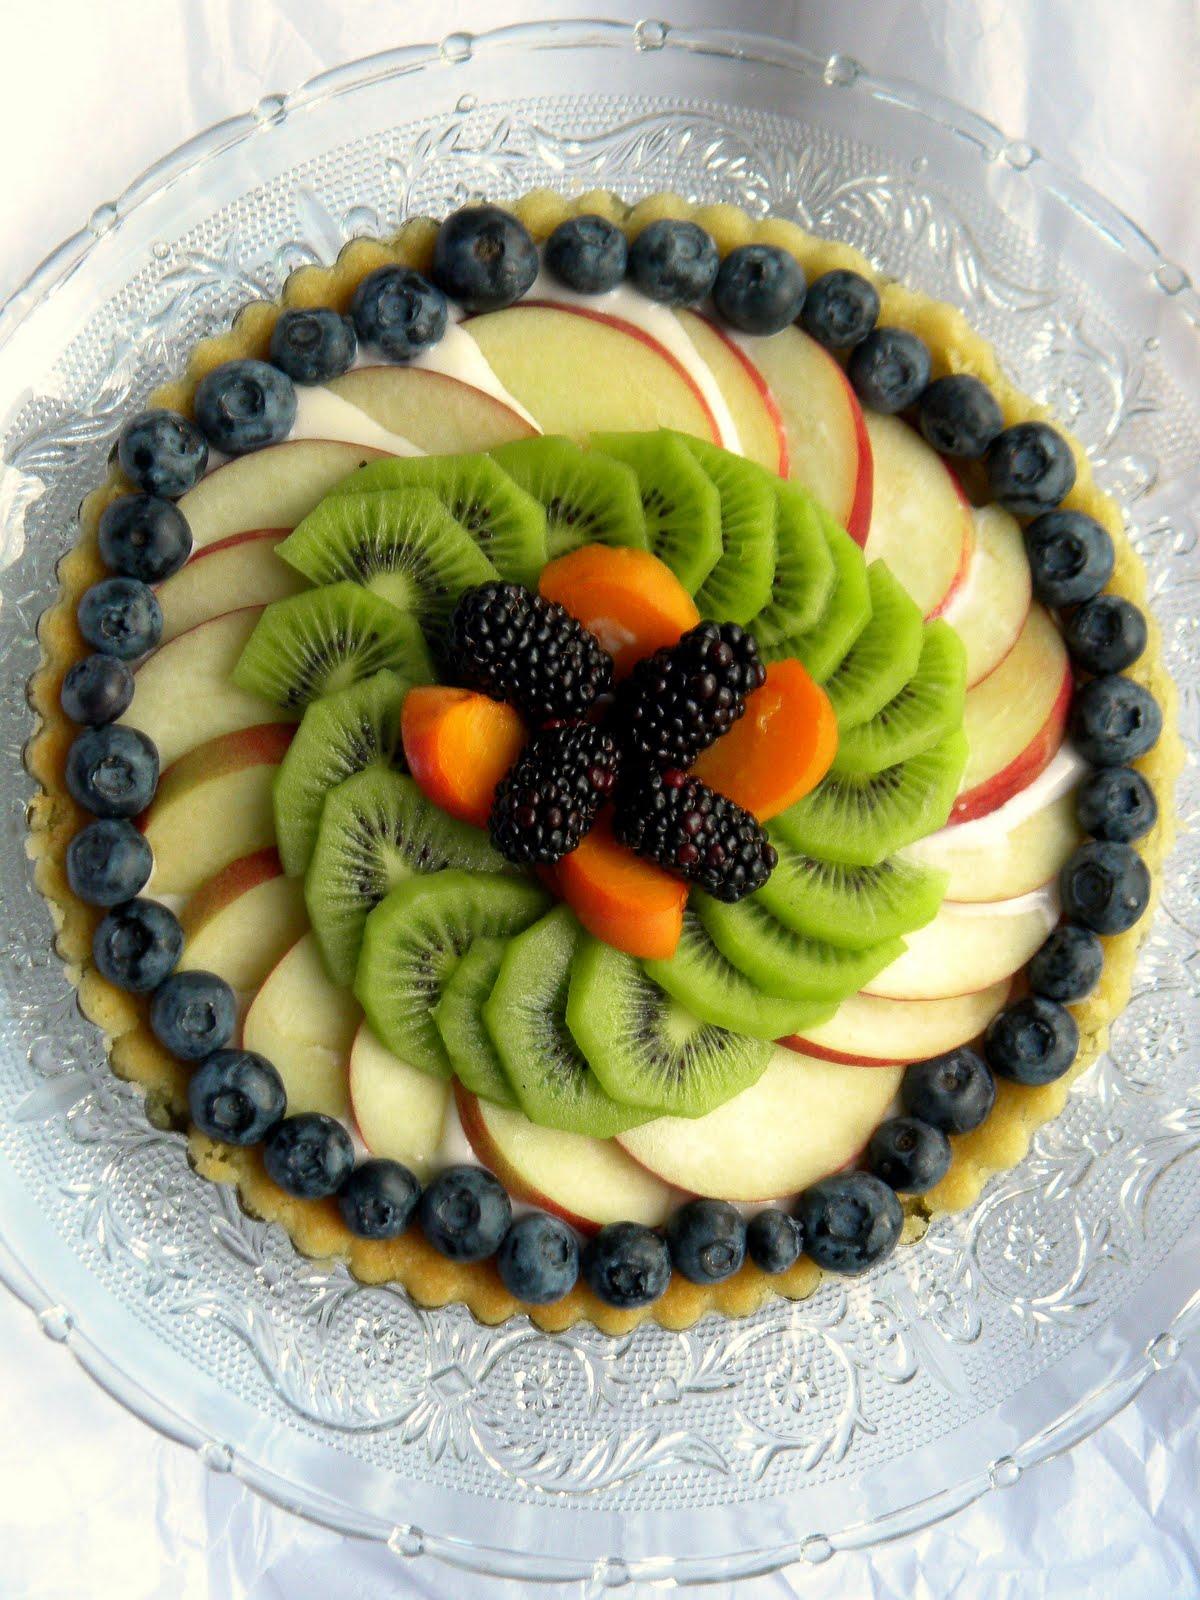 v g talien tarte aux fruits frais the vegan french fresh. Black Bedroom Furniture Sets. Home Design Ideas